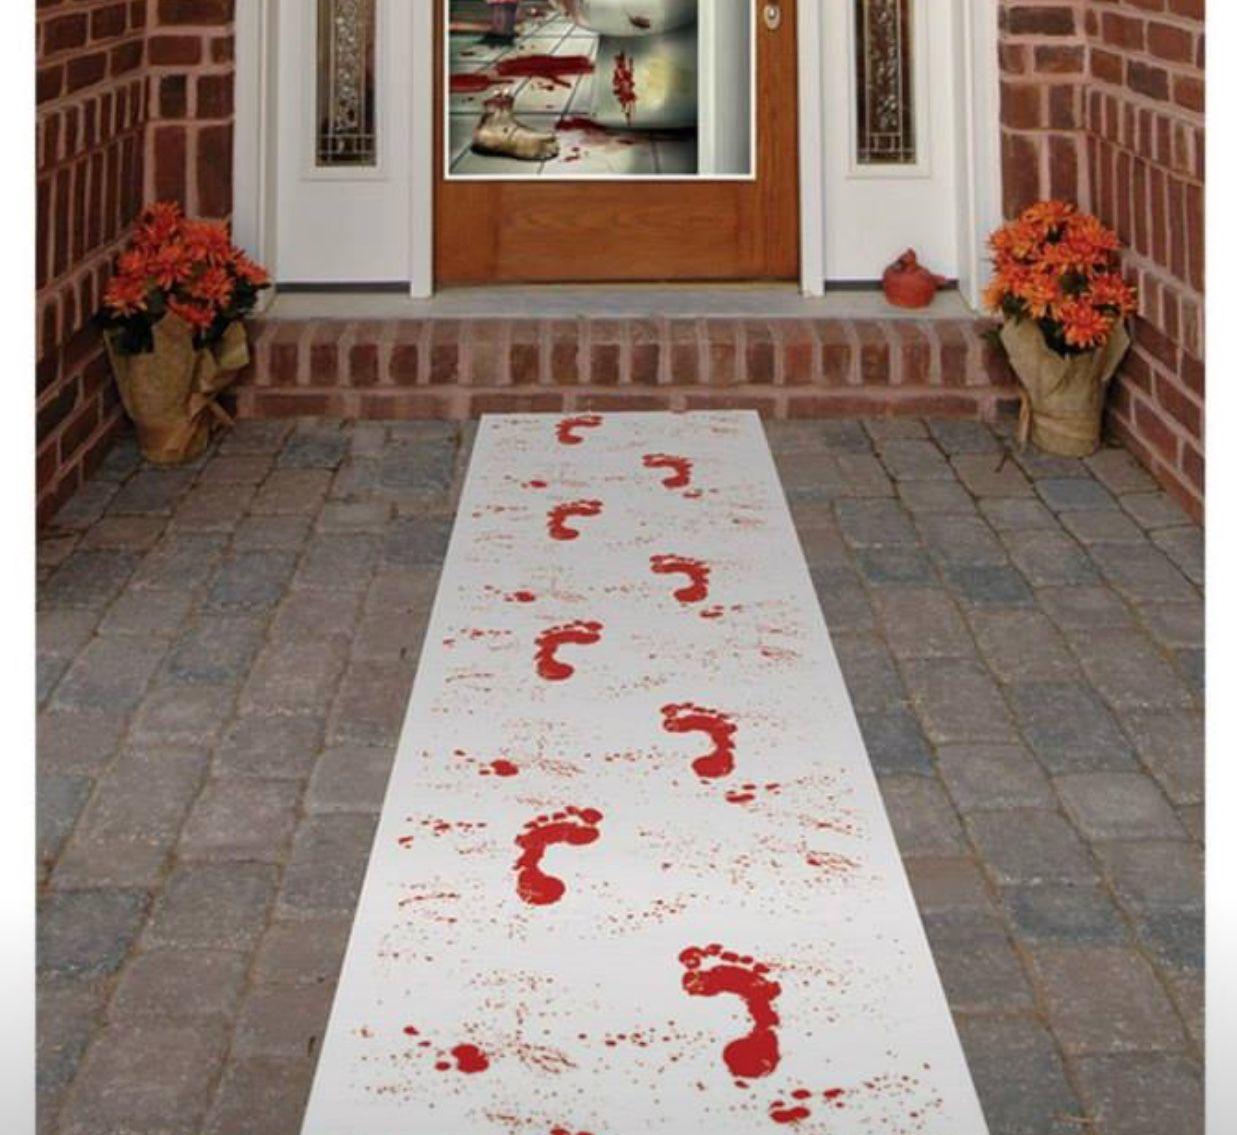 This would be cute. Too creepy? Rustic laminate flooring